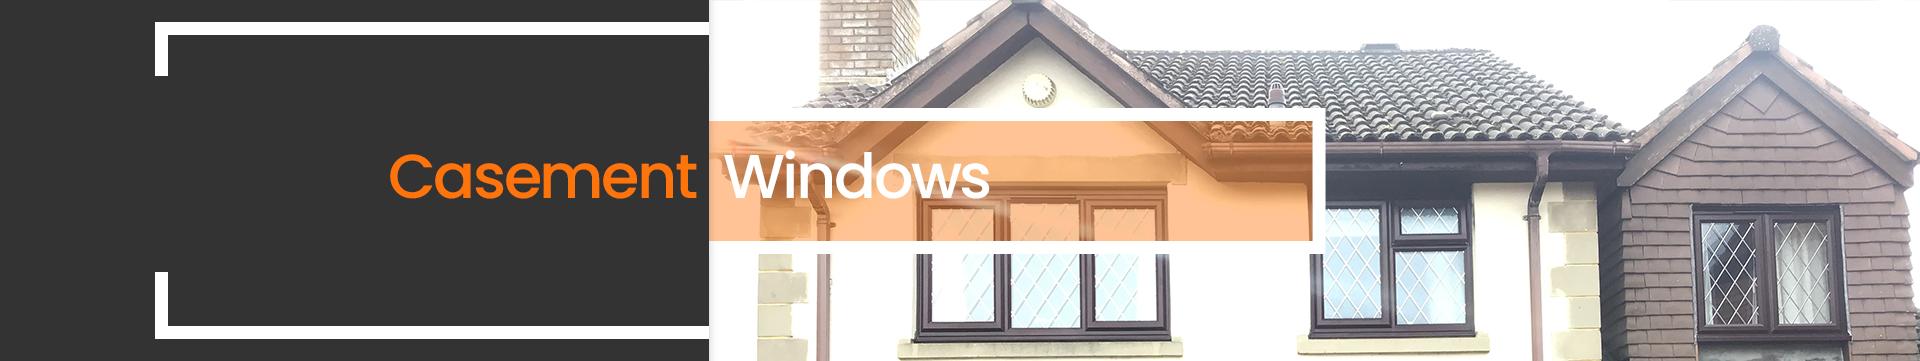 Casement windows banner image